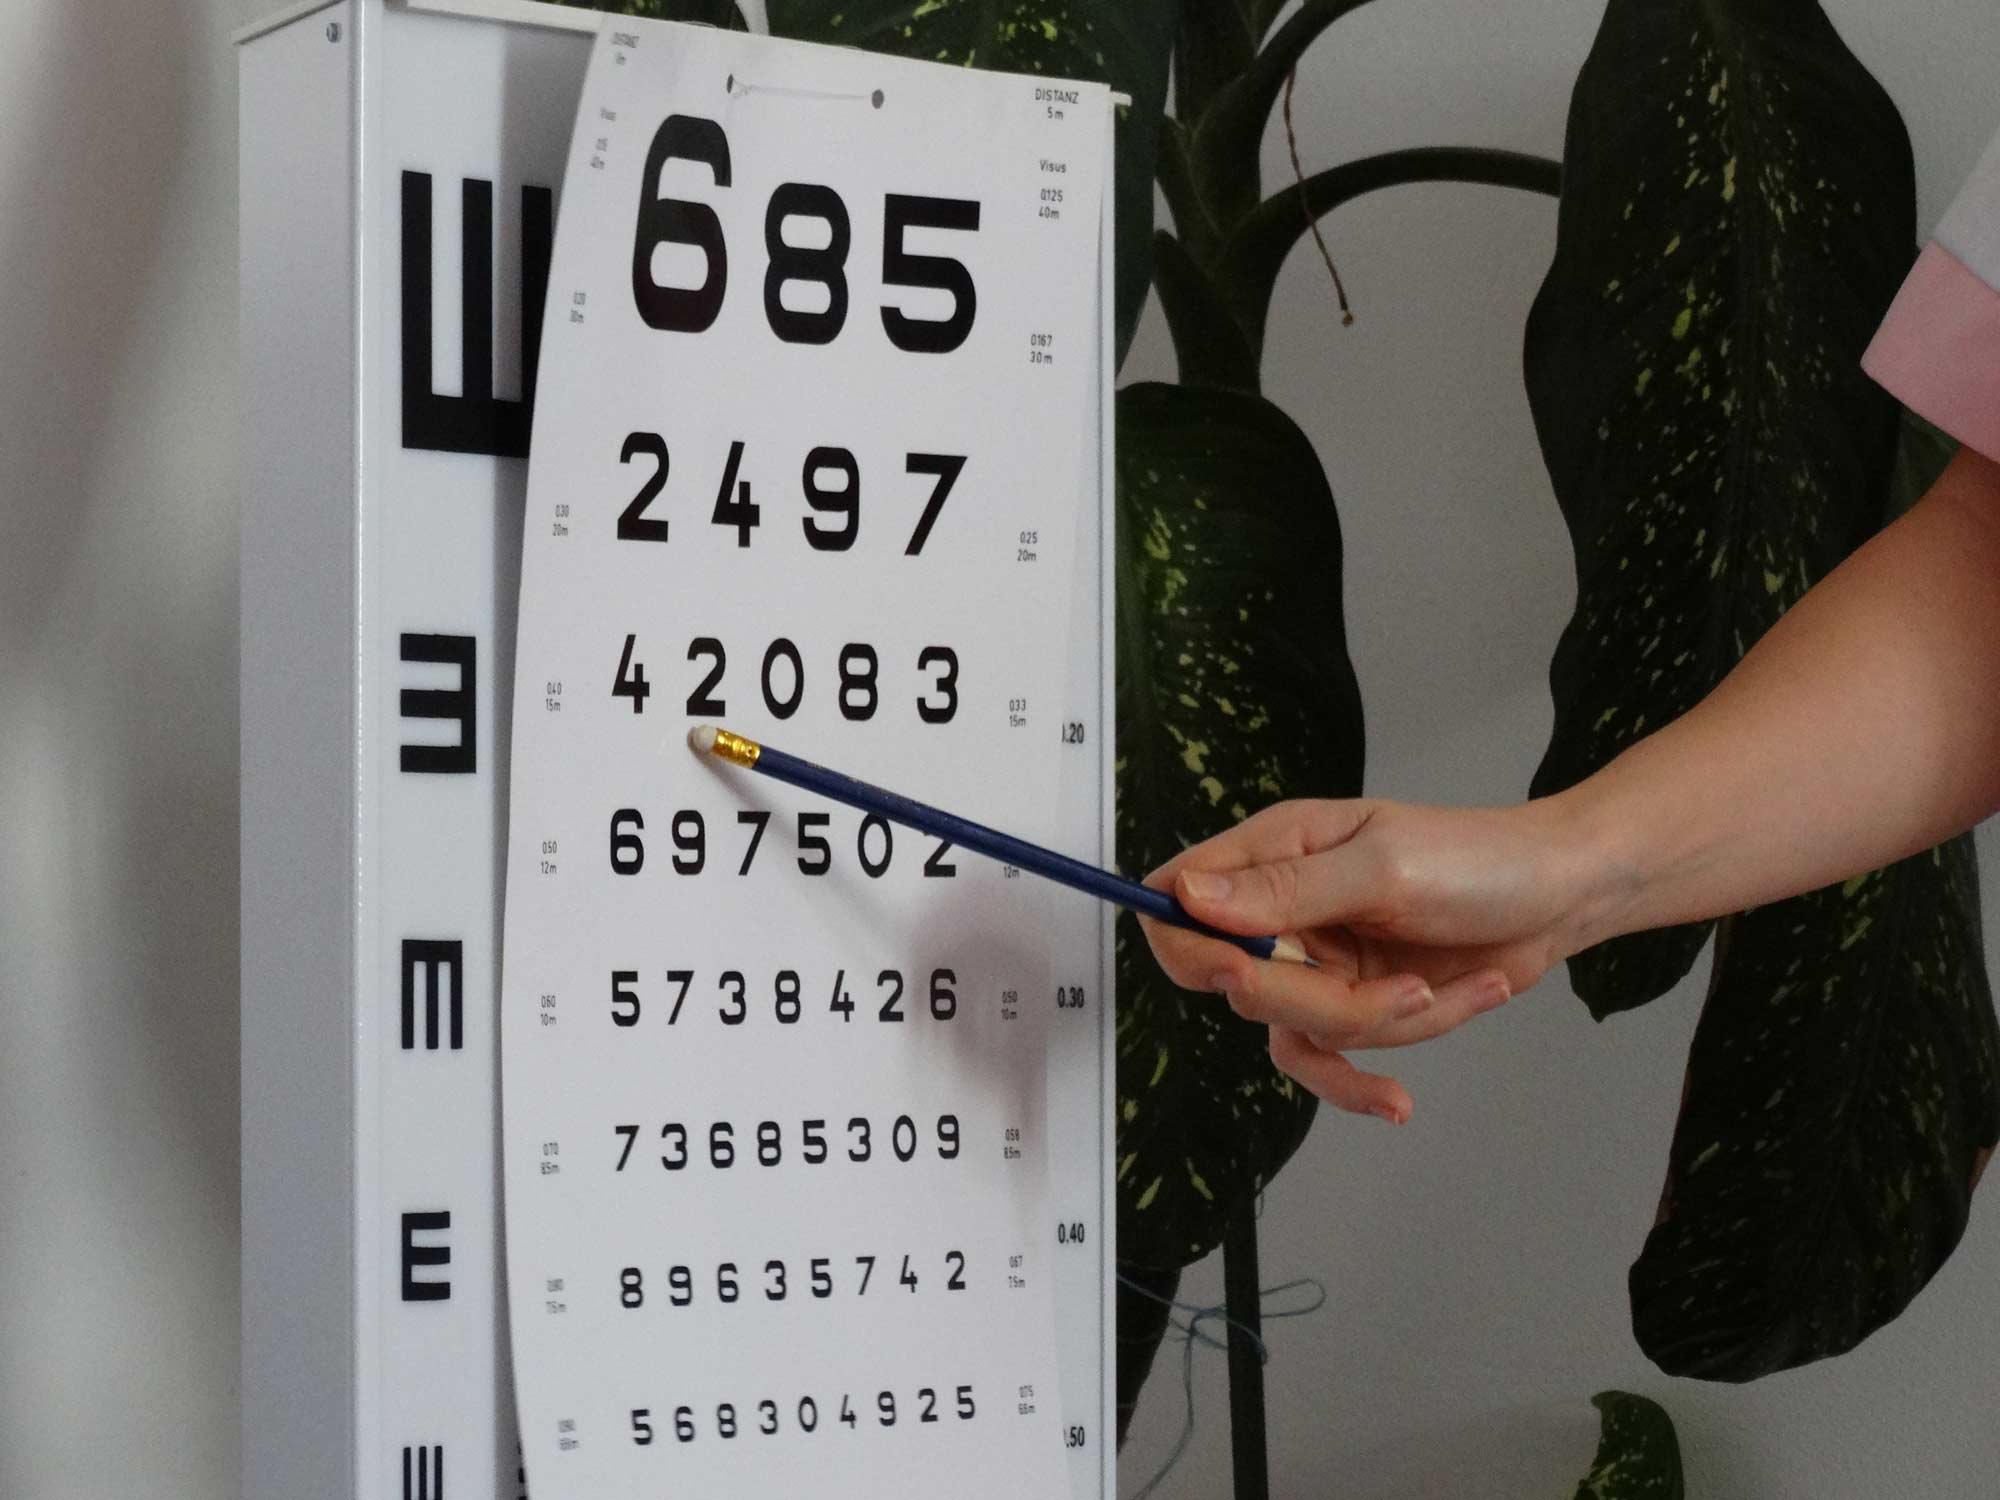 Photo of Д-р Луиз Панайотова: Ако детето е с главоболие и присвива очи, заведете го на очен лекар